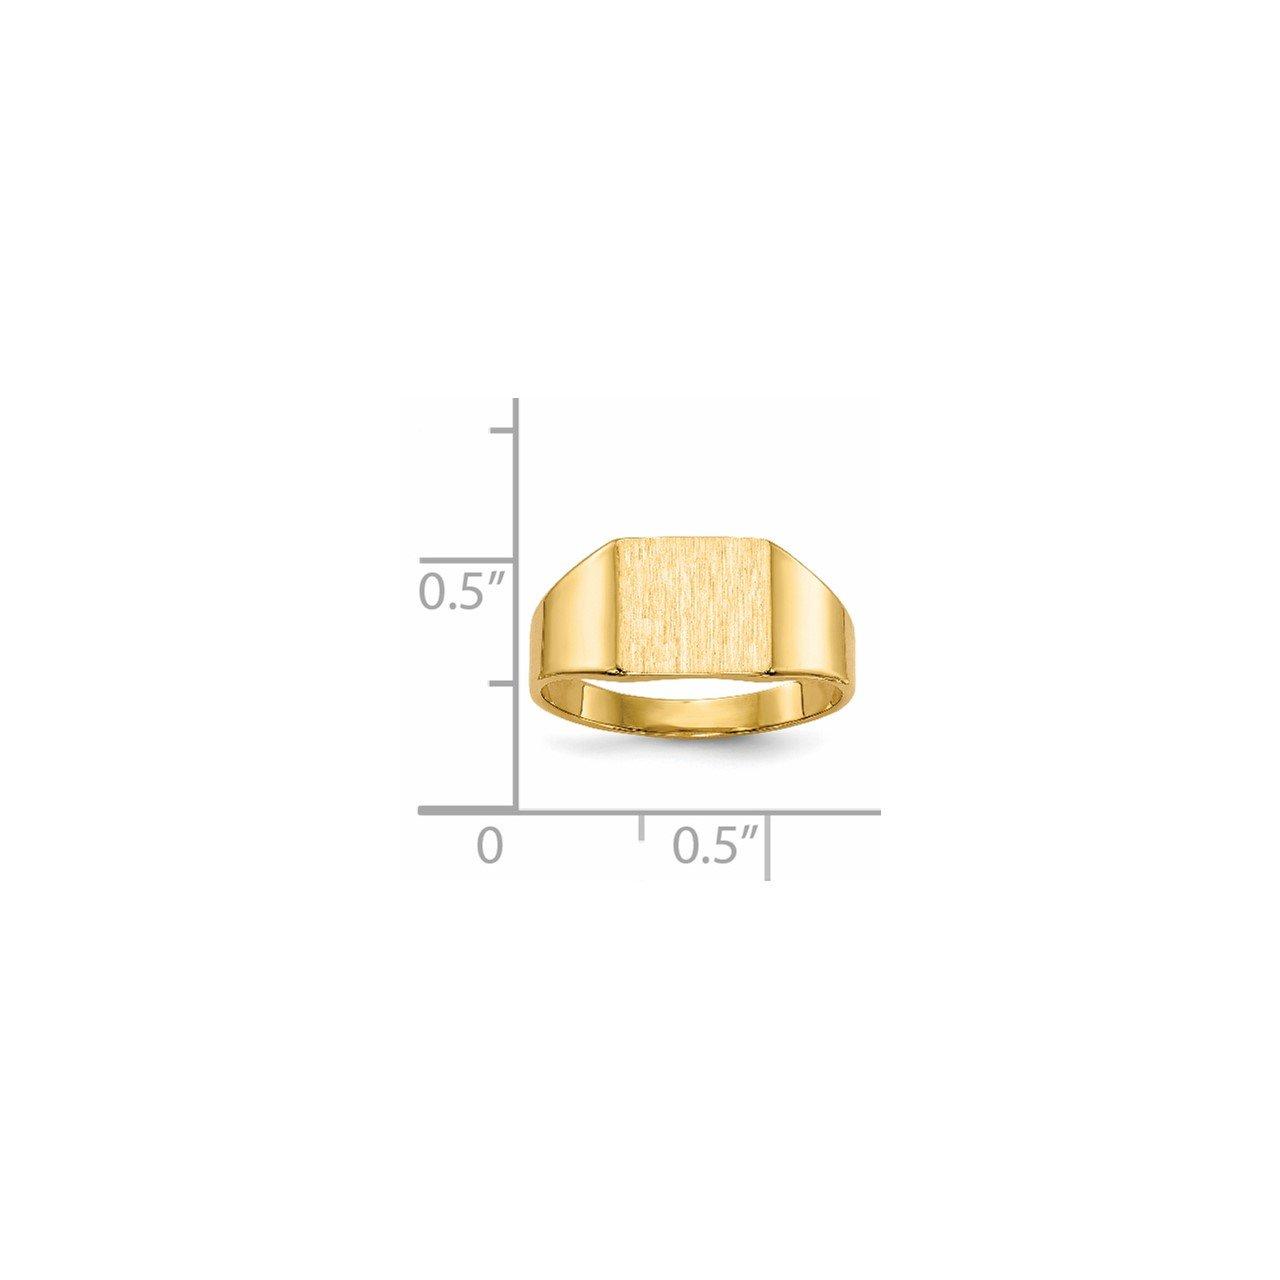 14k 8.5x7.0mm Closed Back Signet Ring-4